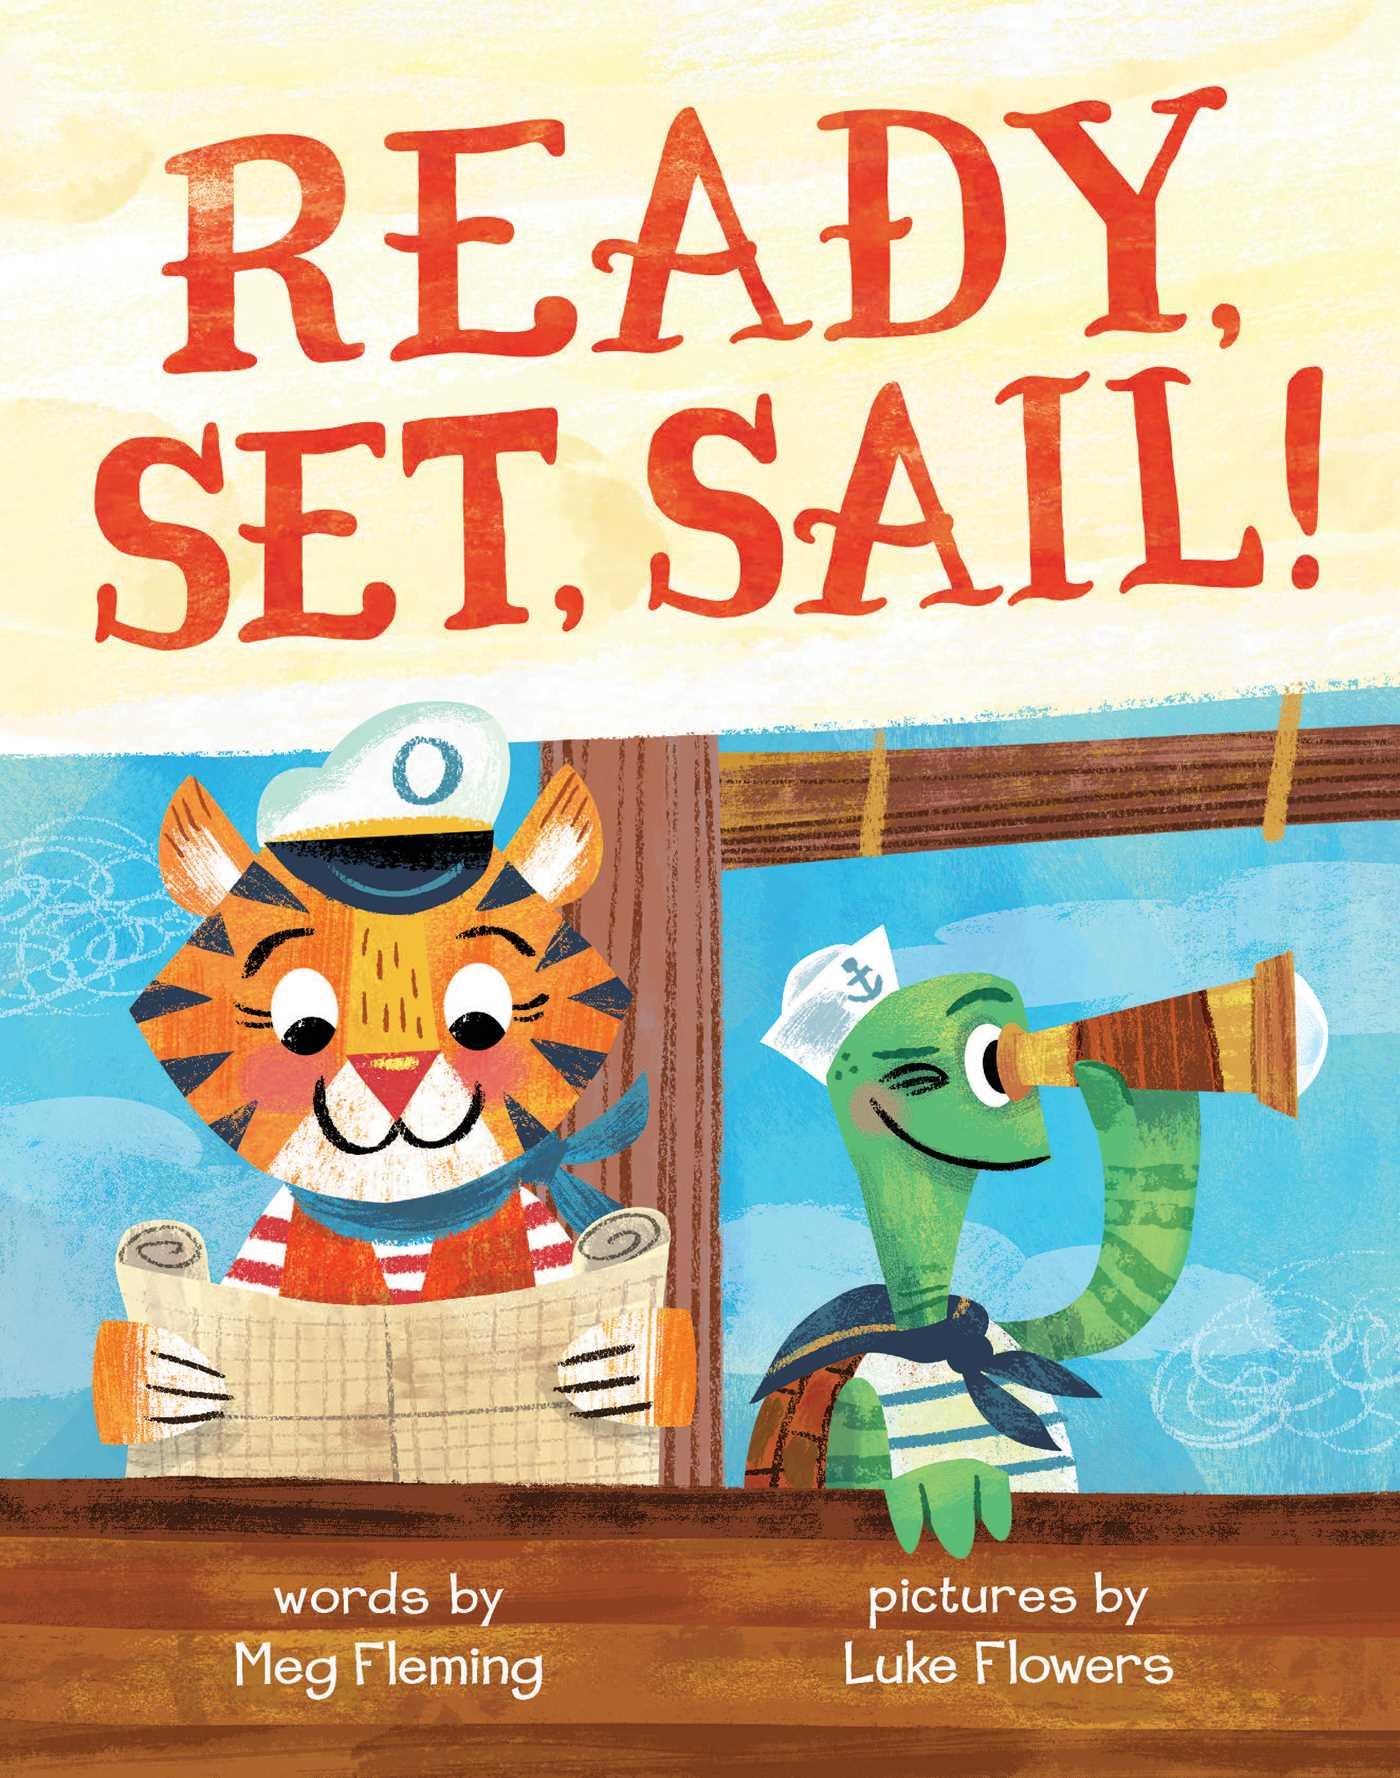 Ready set sail 9781499805338 hr